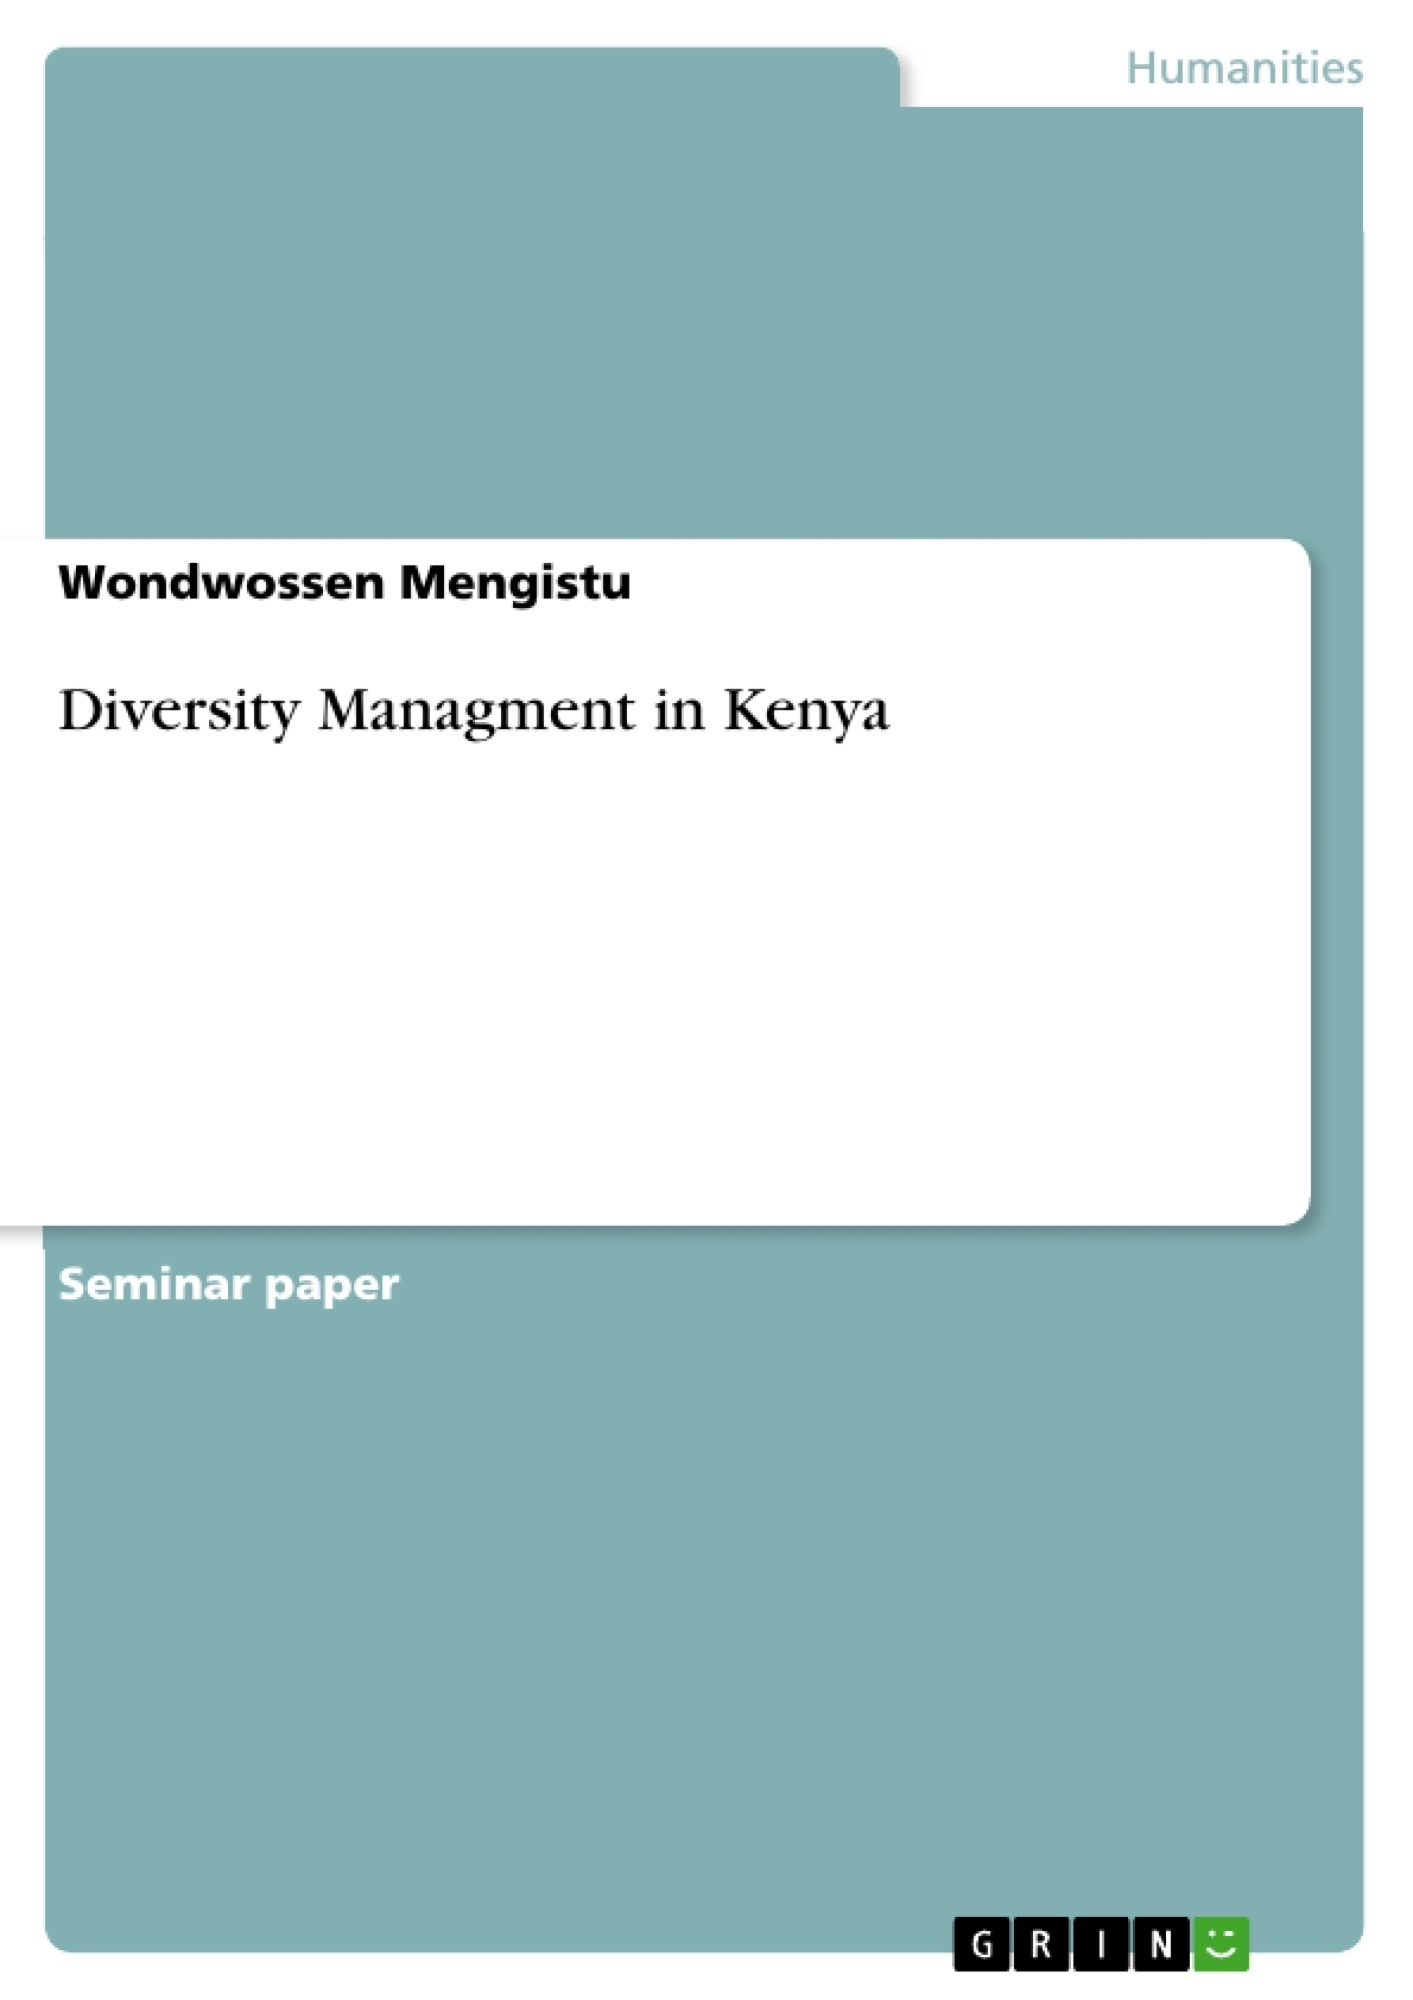 Title: Diversity Managment in Kenya